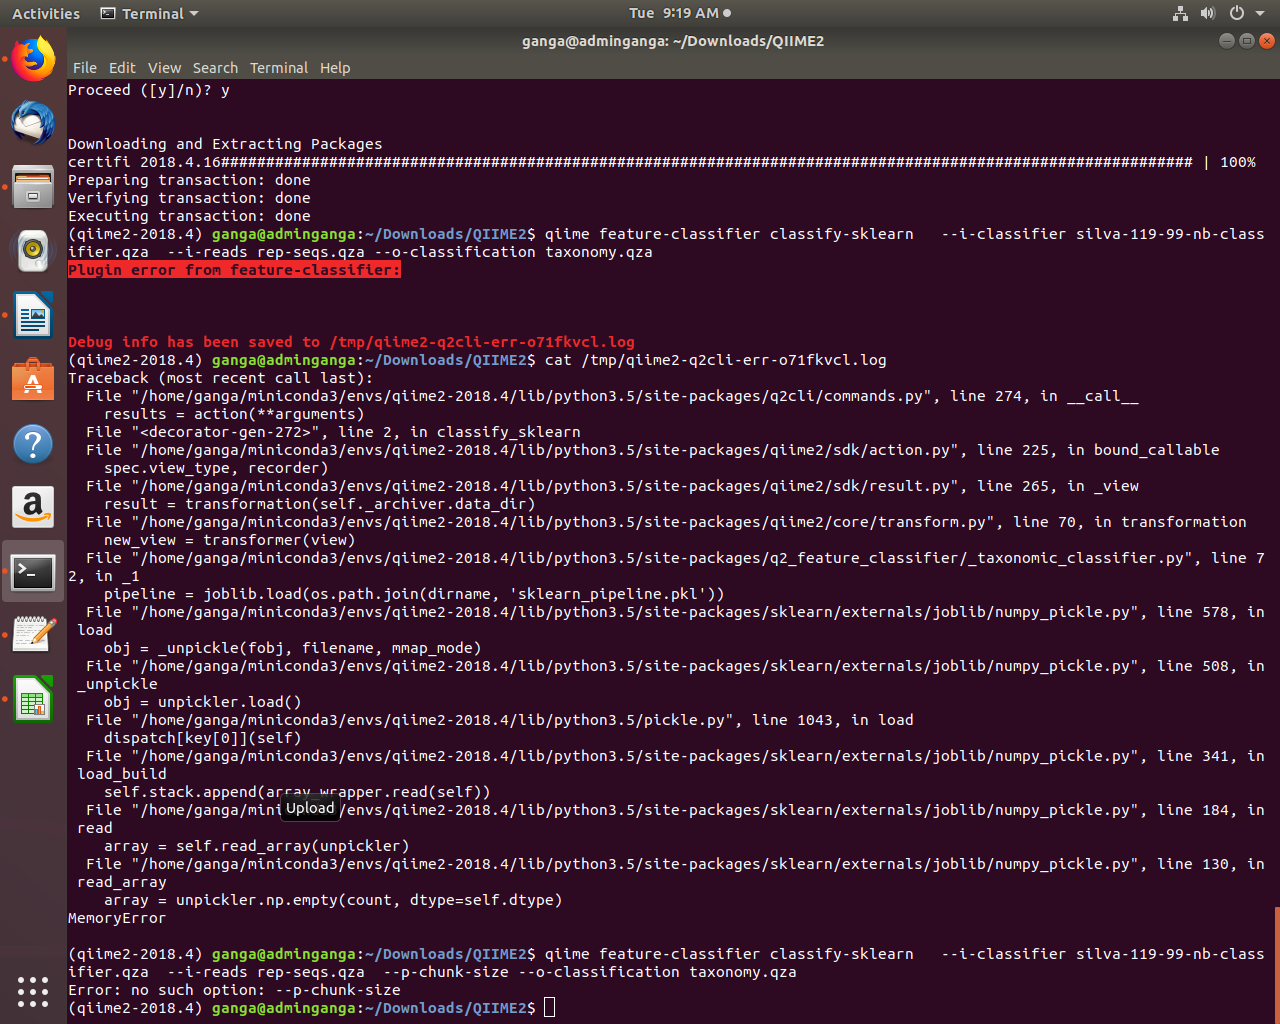 Plugin error from feature-classifier: Memory Error - User